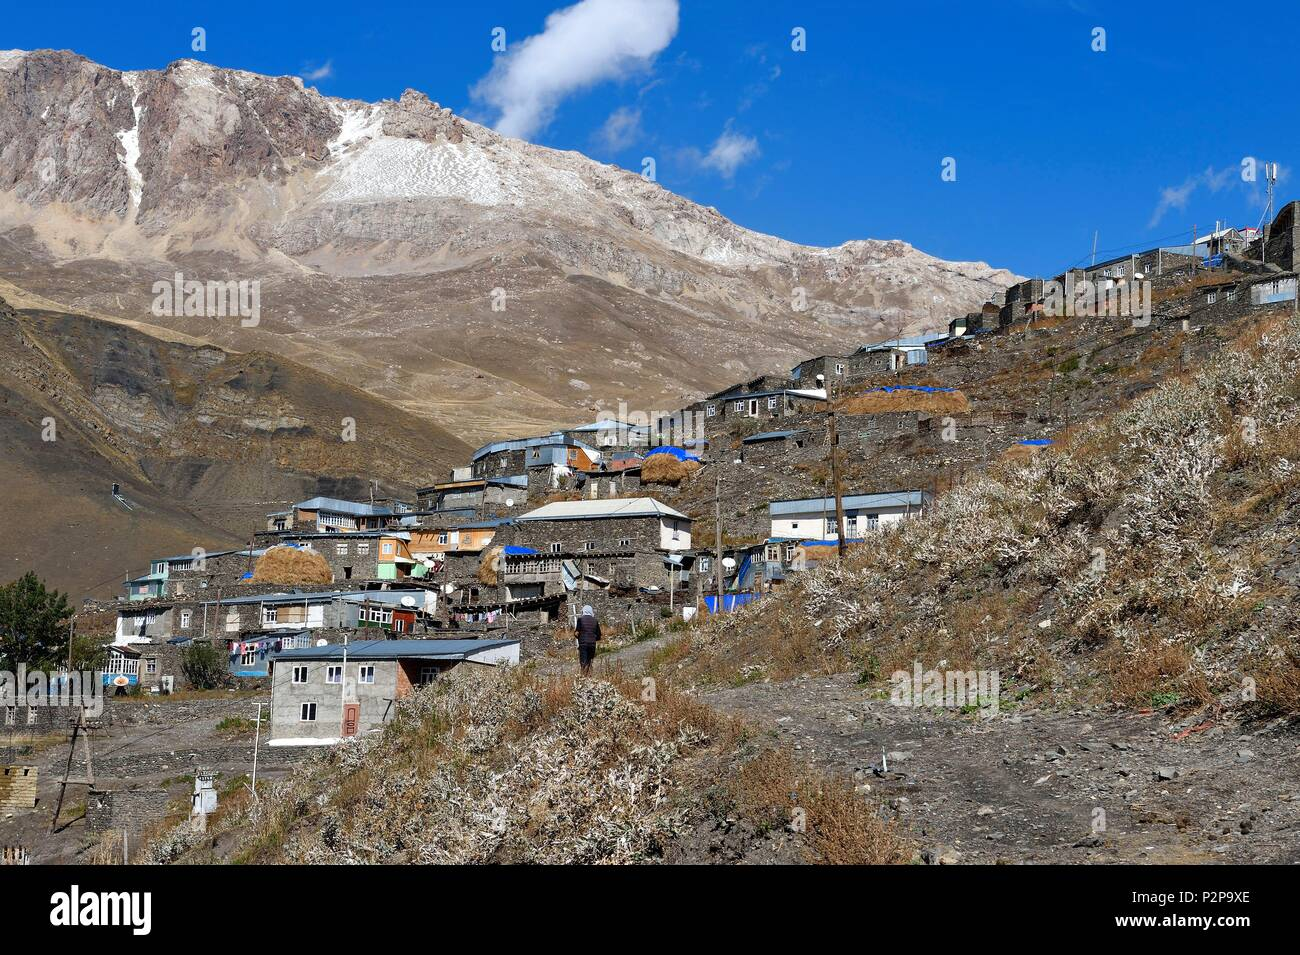 Azerbaijan, Quba (Guba) region, Greater Caucasus mountain range, village of Khinalug (Xinaliq) - Stock Image